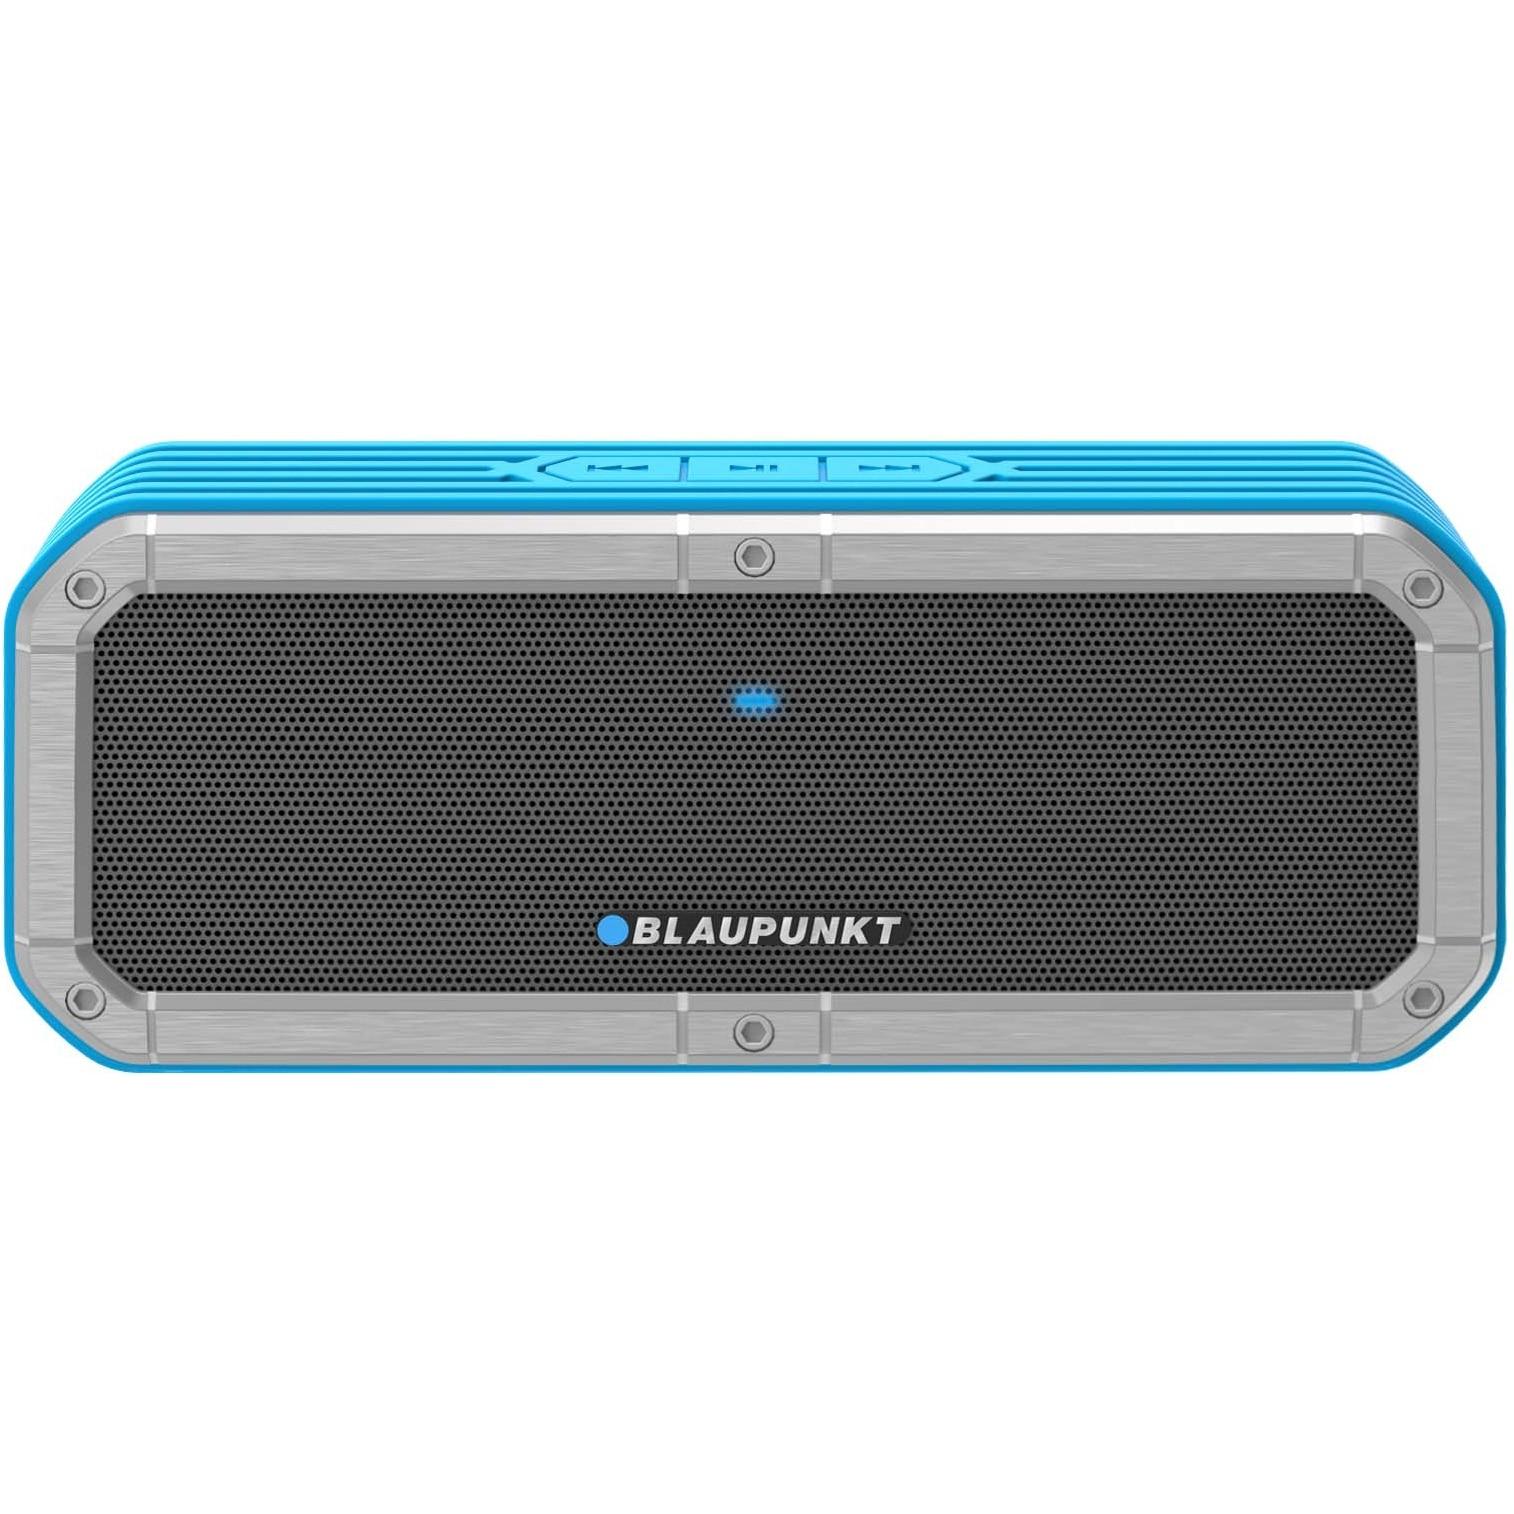 Fotografie Boxa portabila Blaupunkt BT12Outdoor, Bluetooth, FM, MP3, albastru